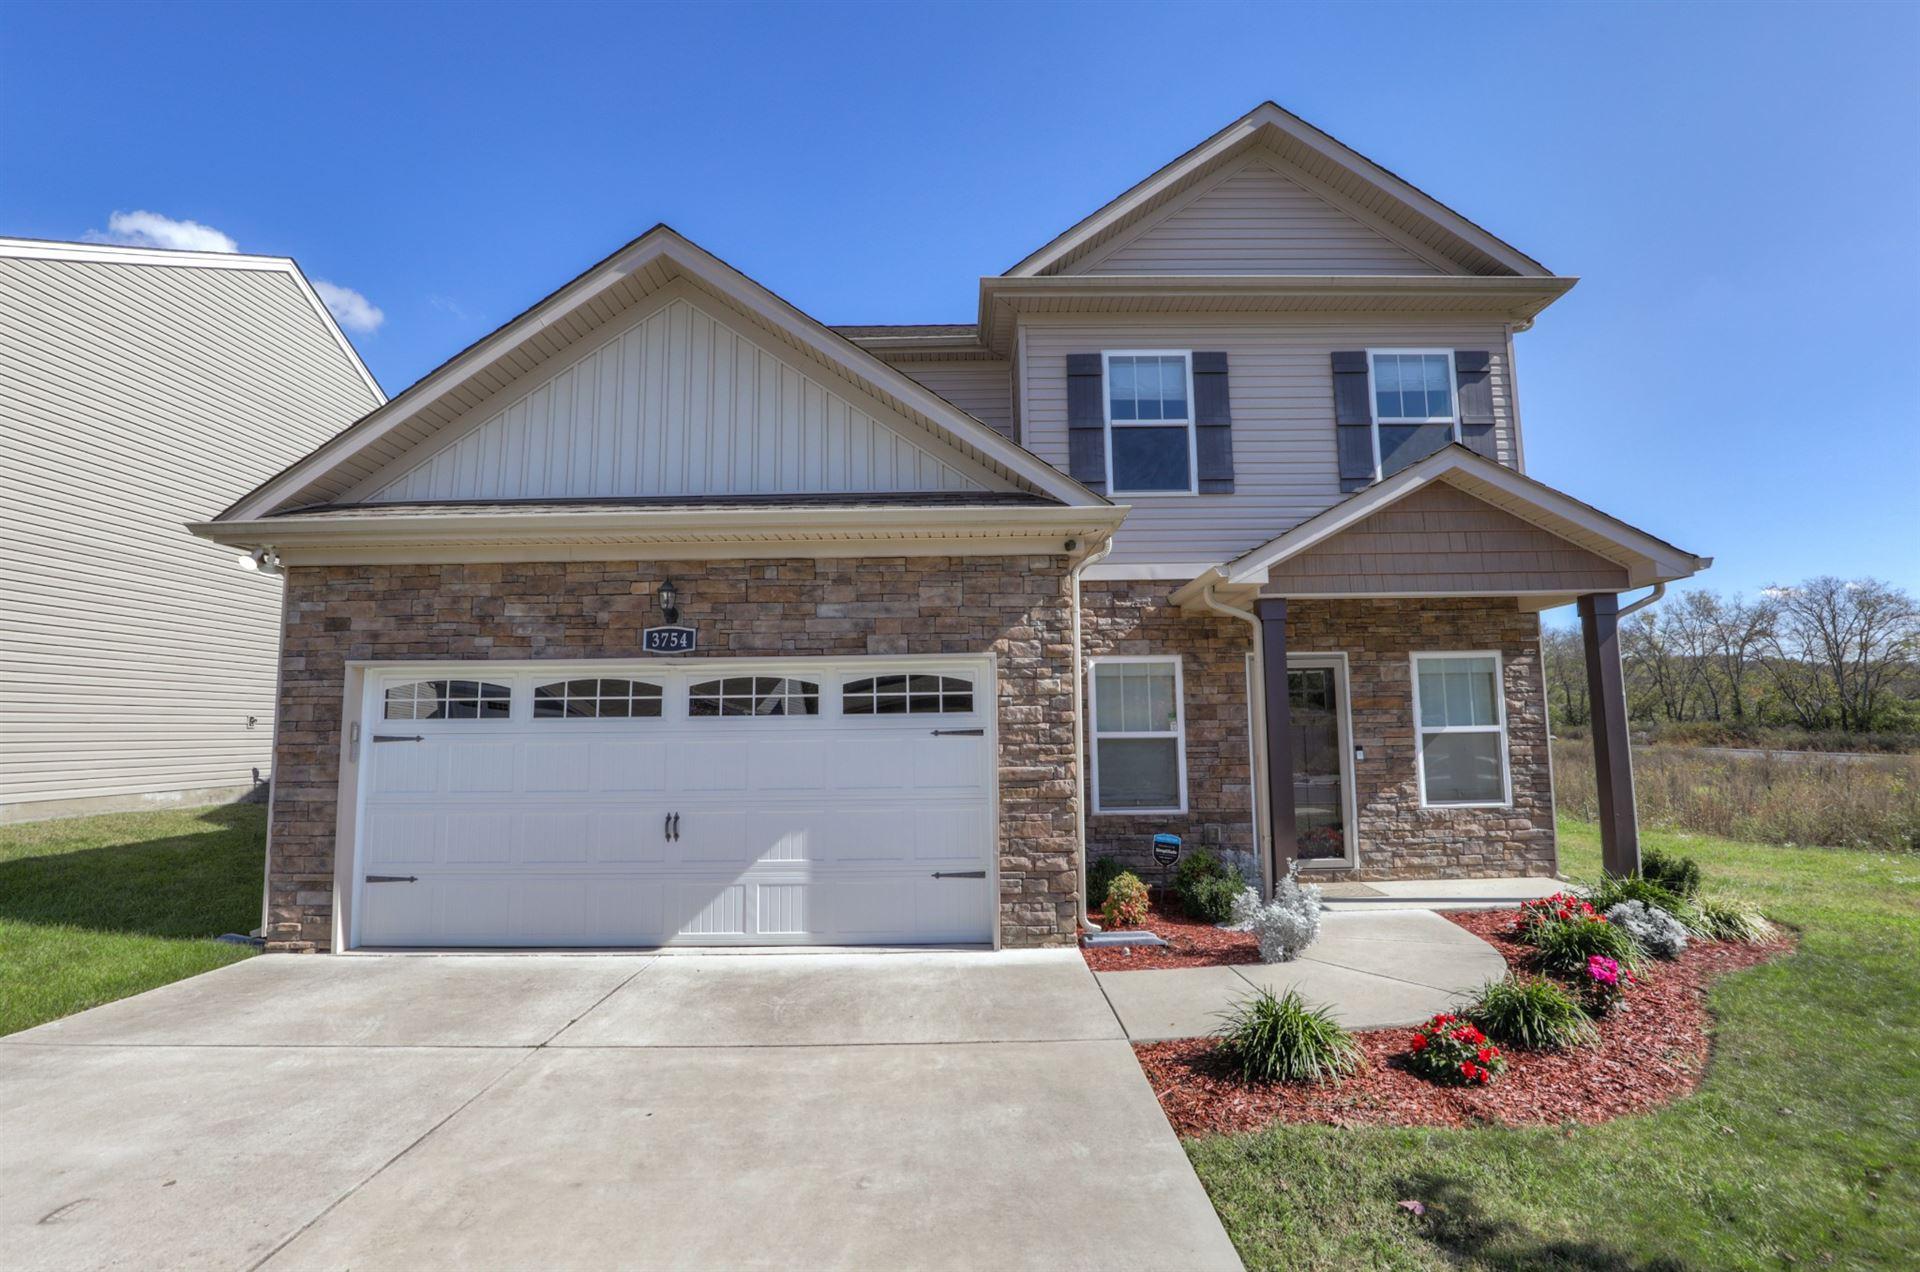 3754 Willow Creek Rd, Nashville, TN 37207 - MLS#: 2207302